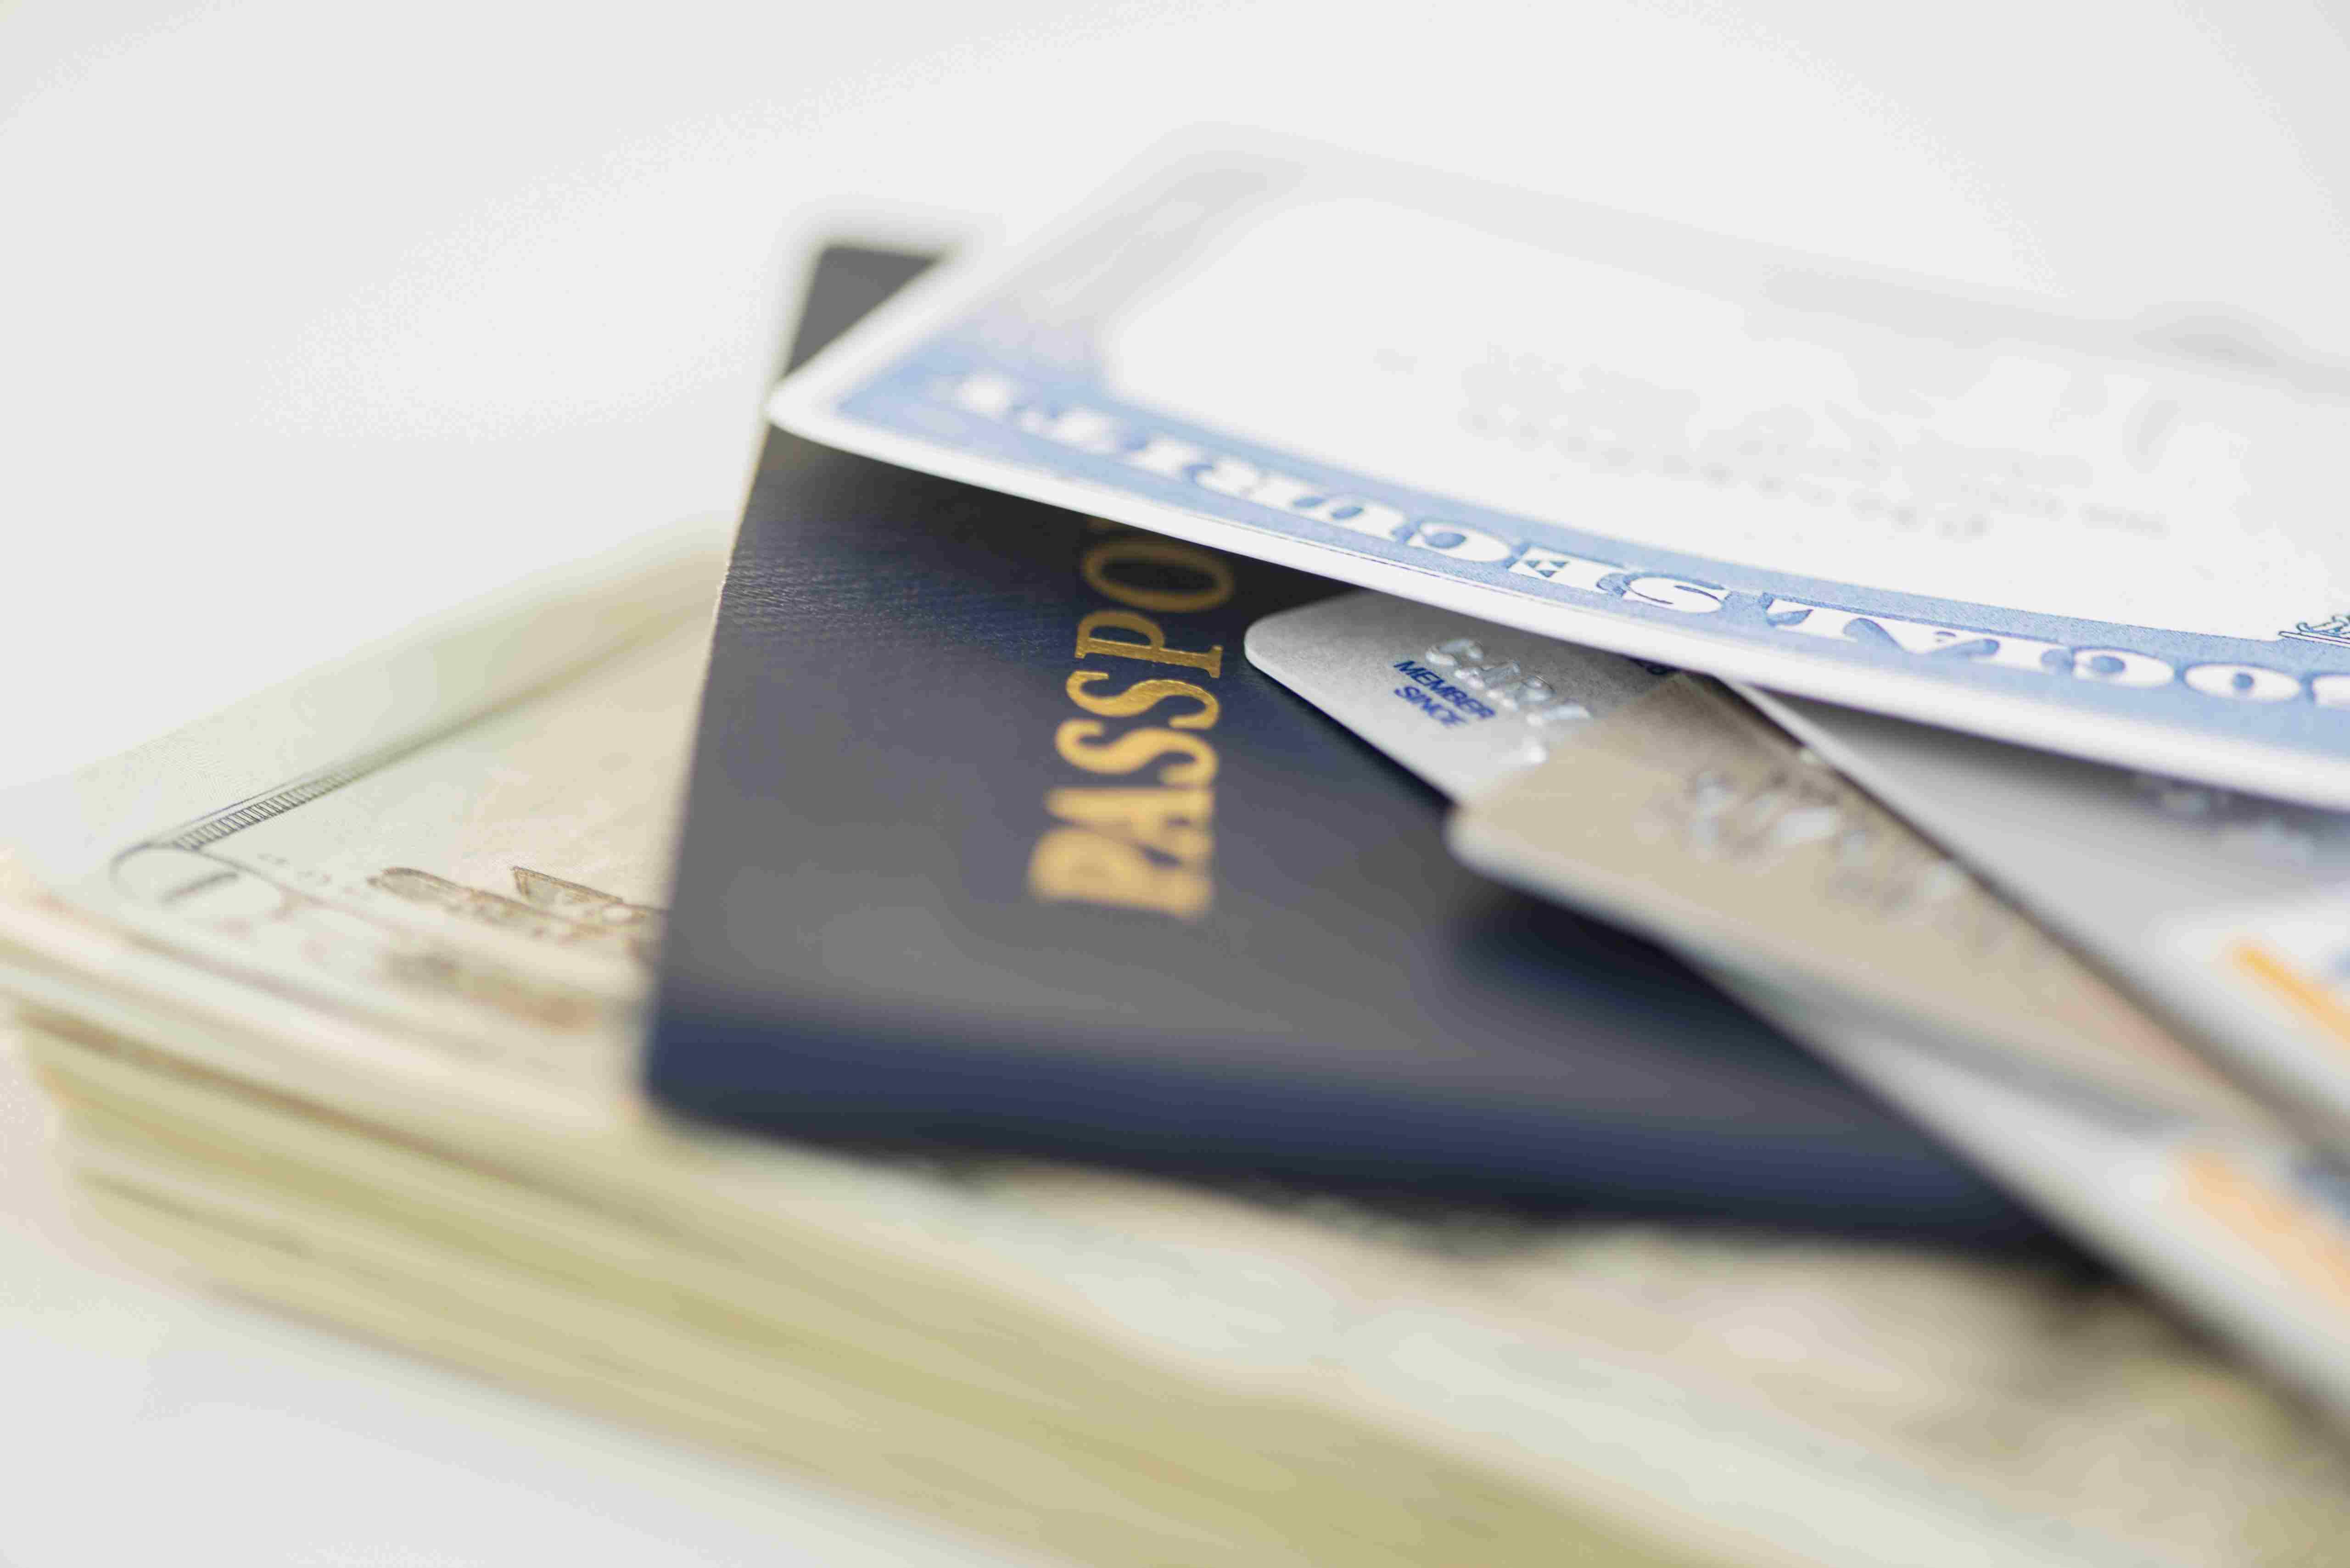 USA, New Jersey, Jersey City, Close of up passport and Social Security Card